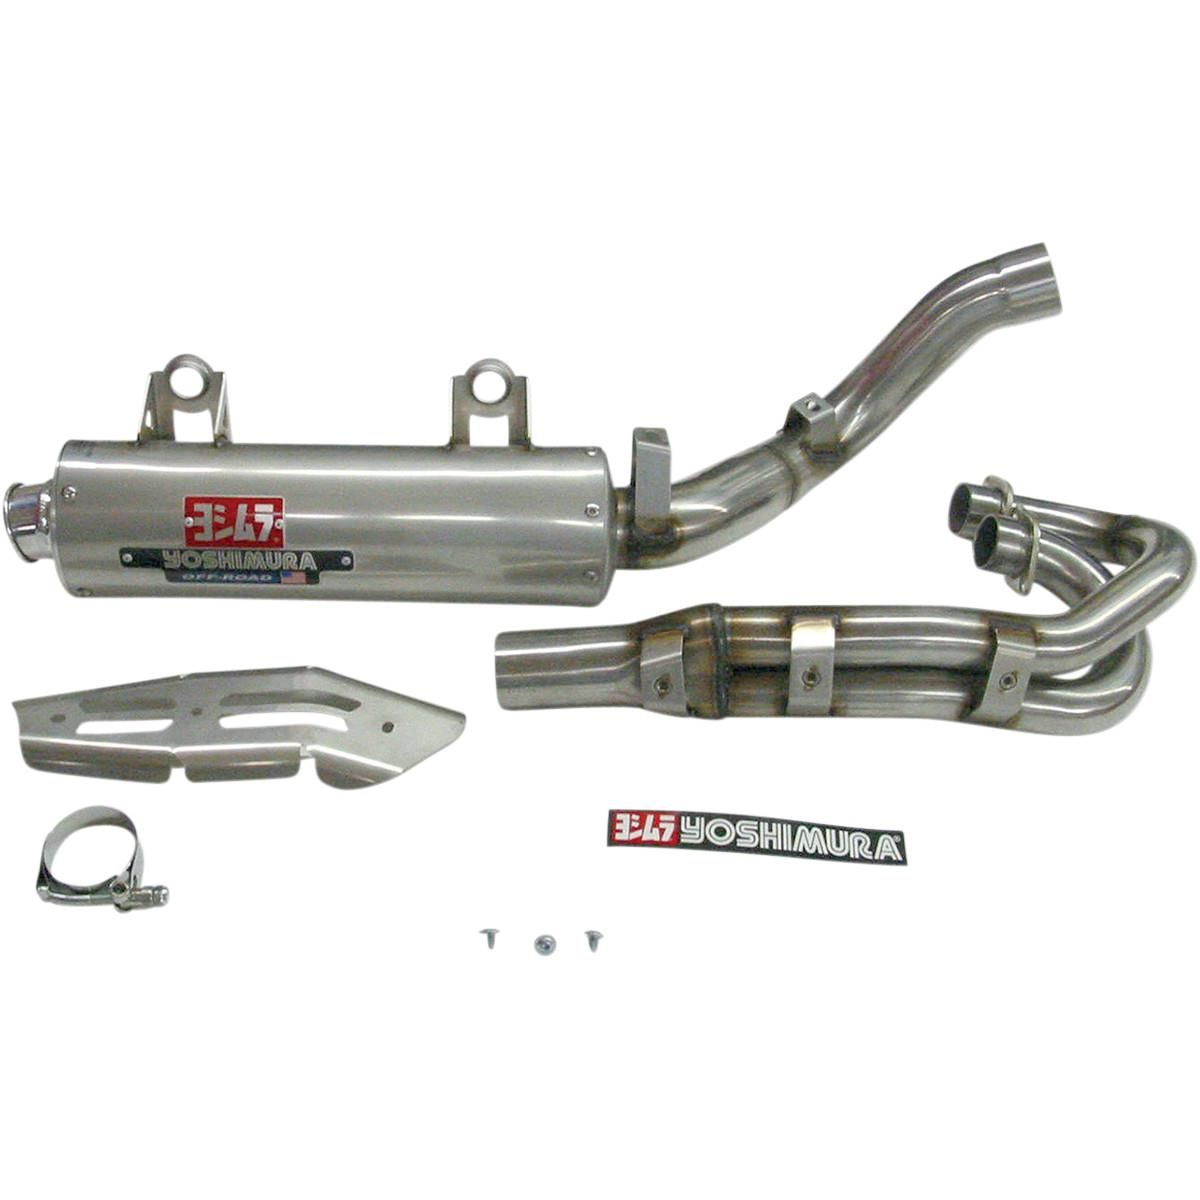 Yoshimura 2550500-SA RS-3 Signature Series Full System - Stainless Steel Muffler